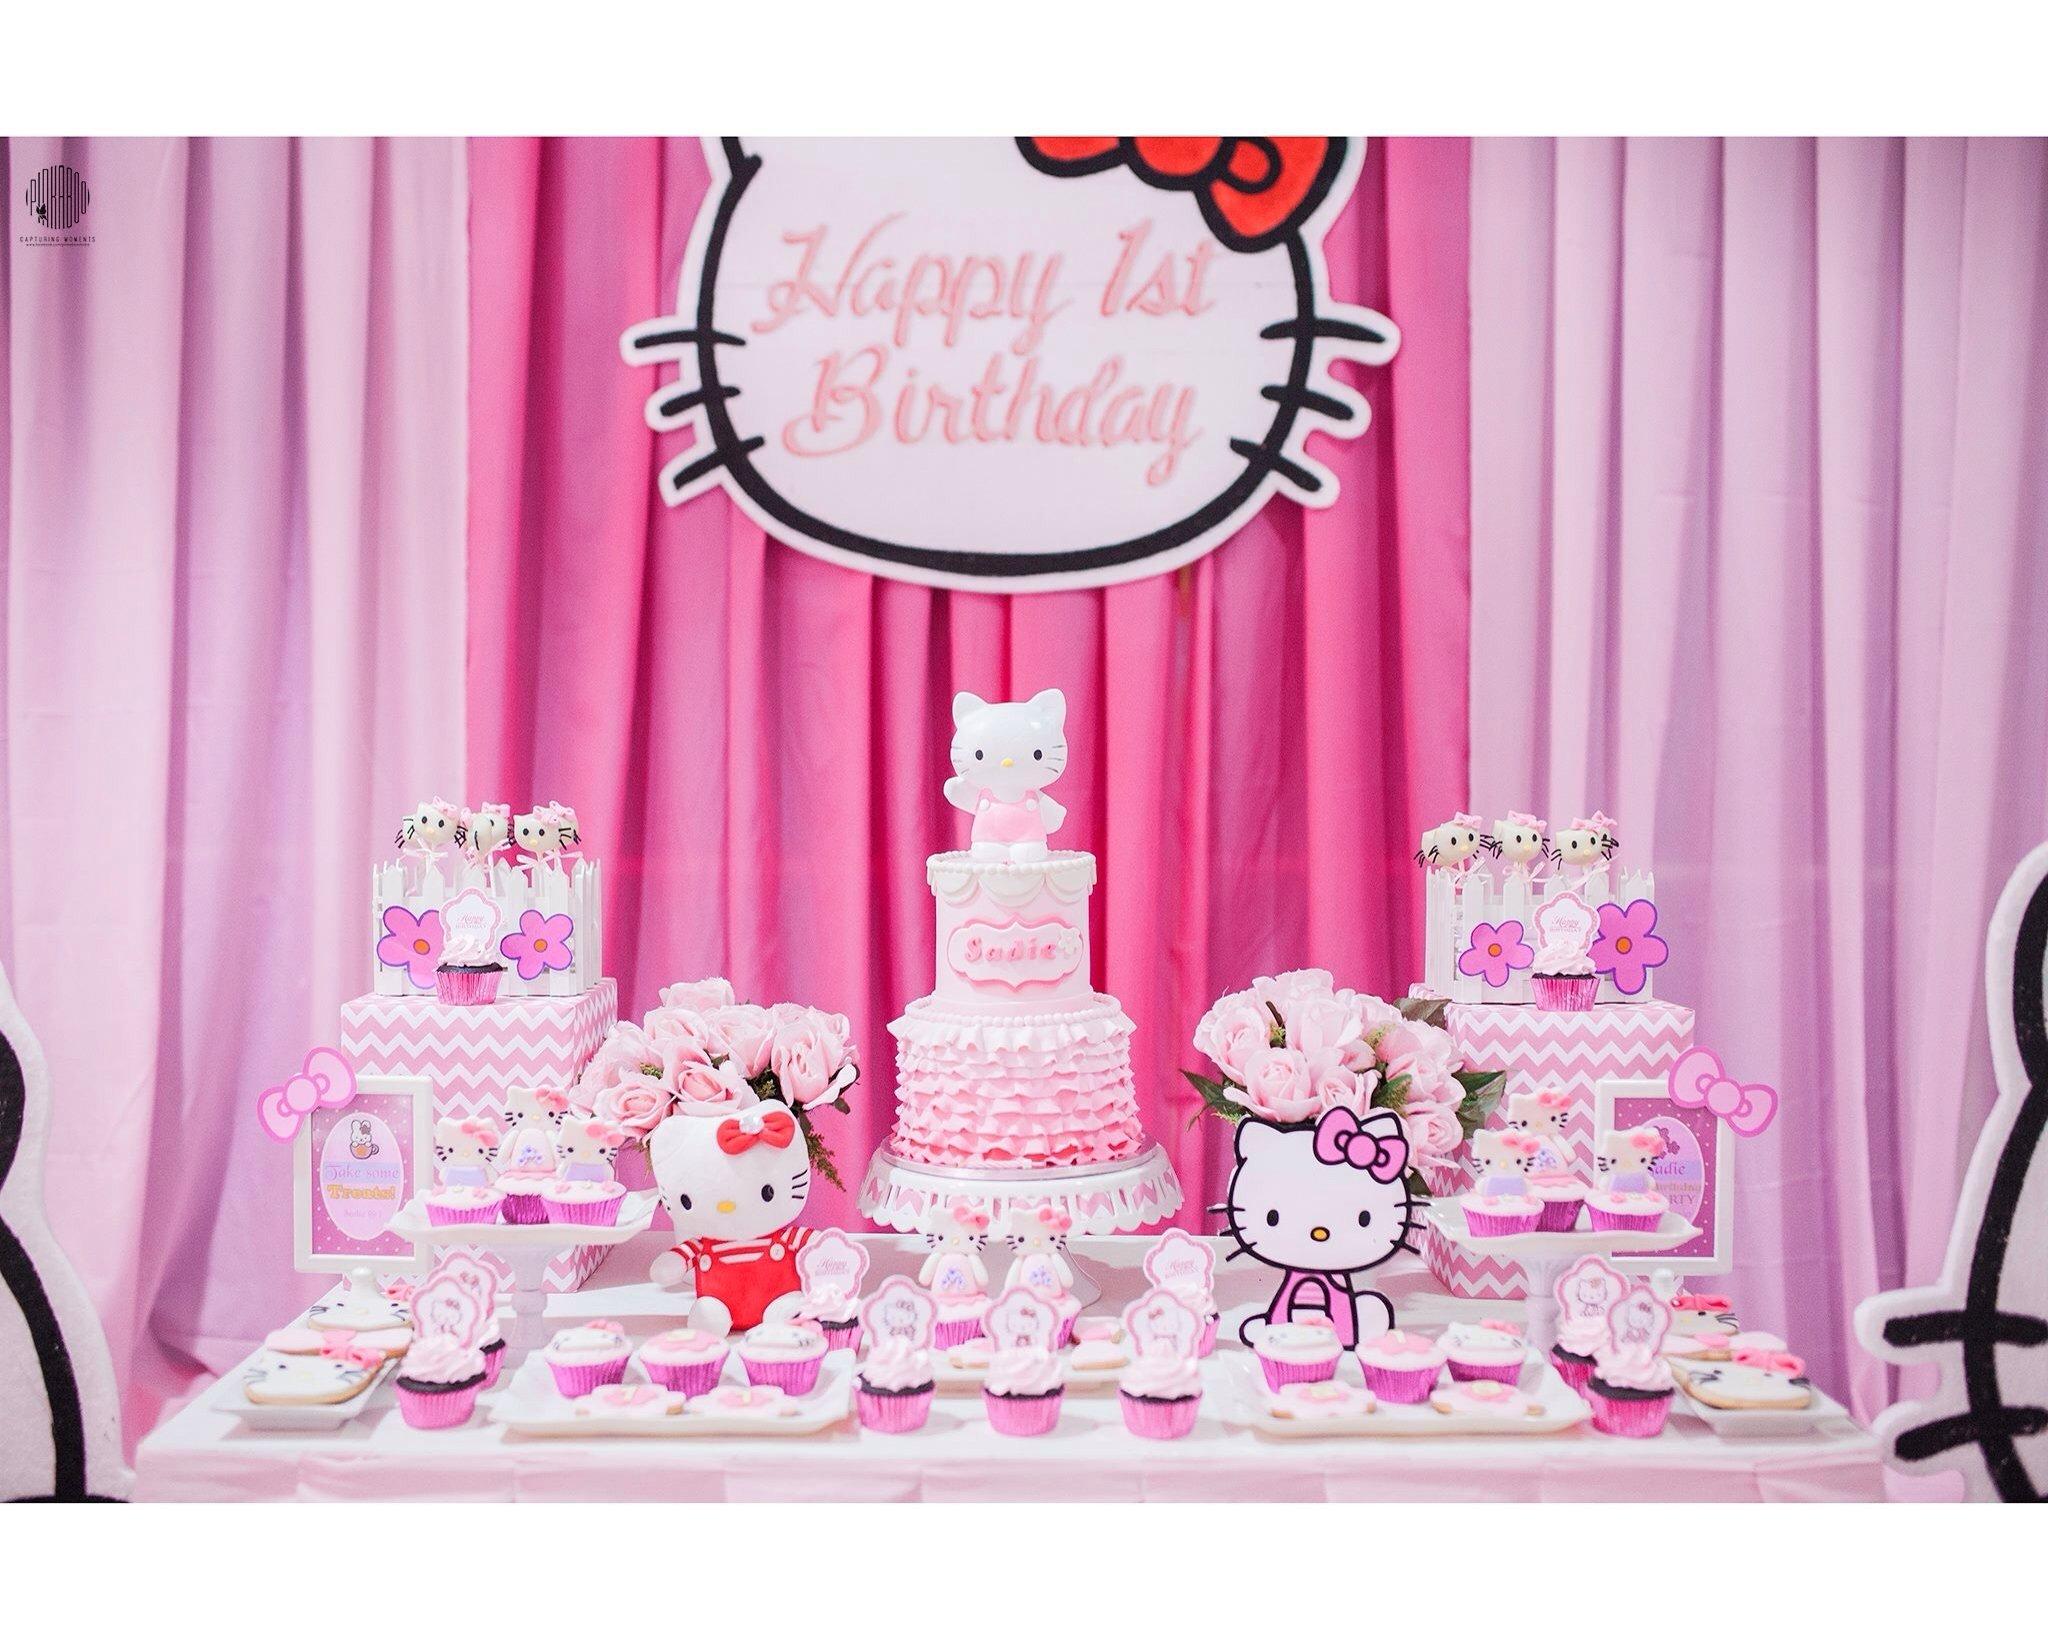 10 Unique Hello Kitty Party Decoration Ideas hello kitty dessert table set upcakecupcakescookies sweet pea 2021